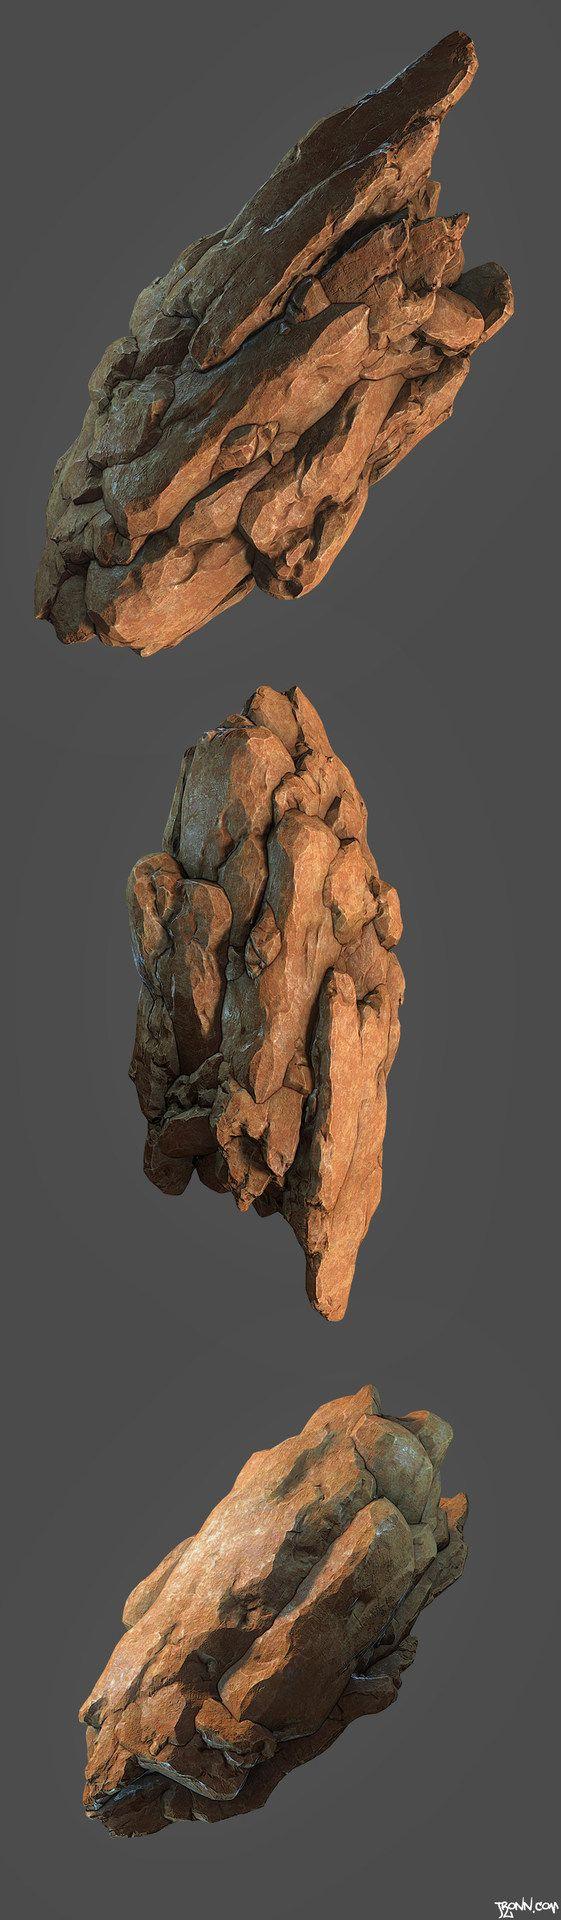 ArtStation - Rocks, Jonas Ronnegard